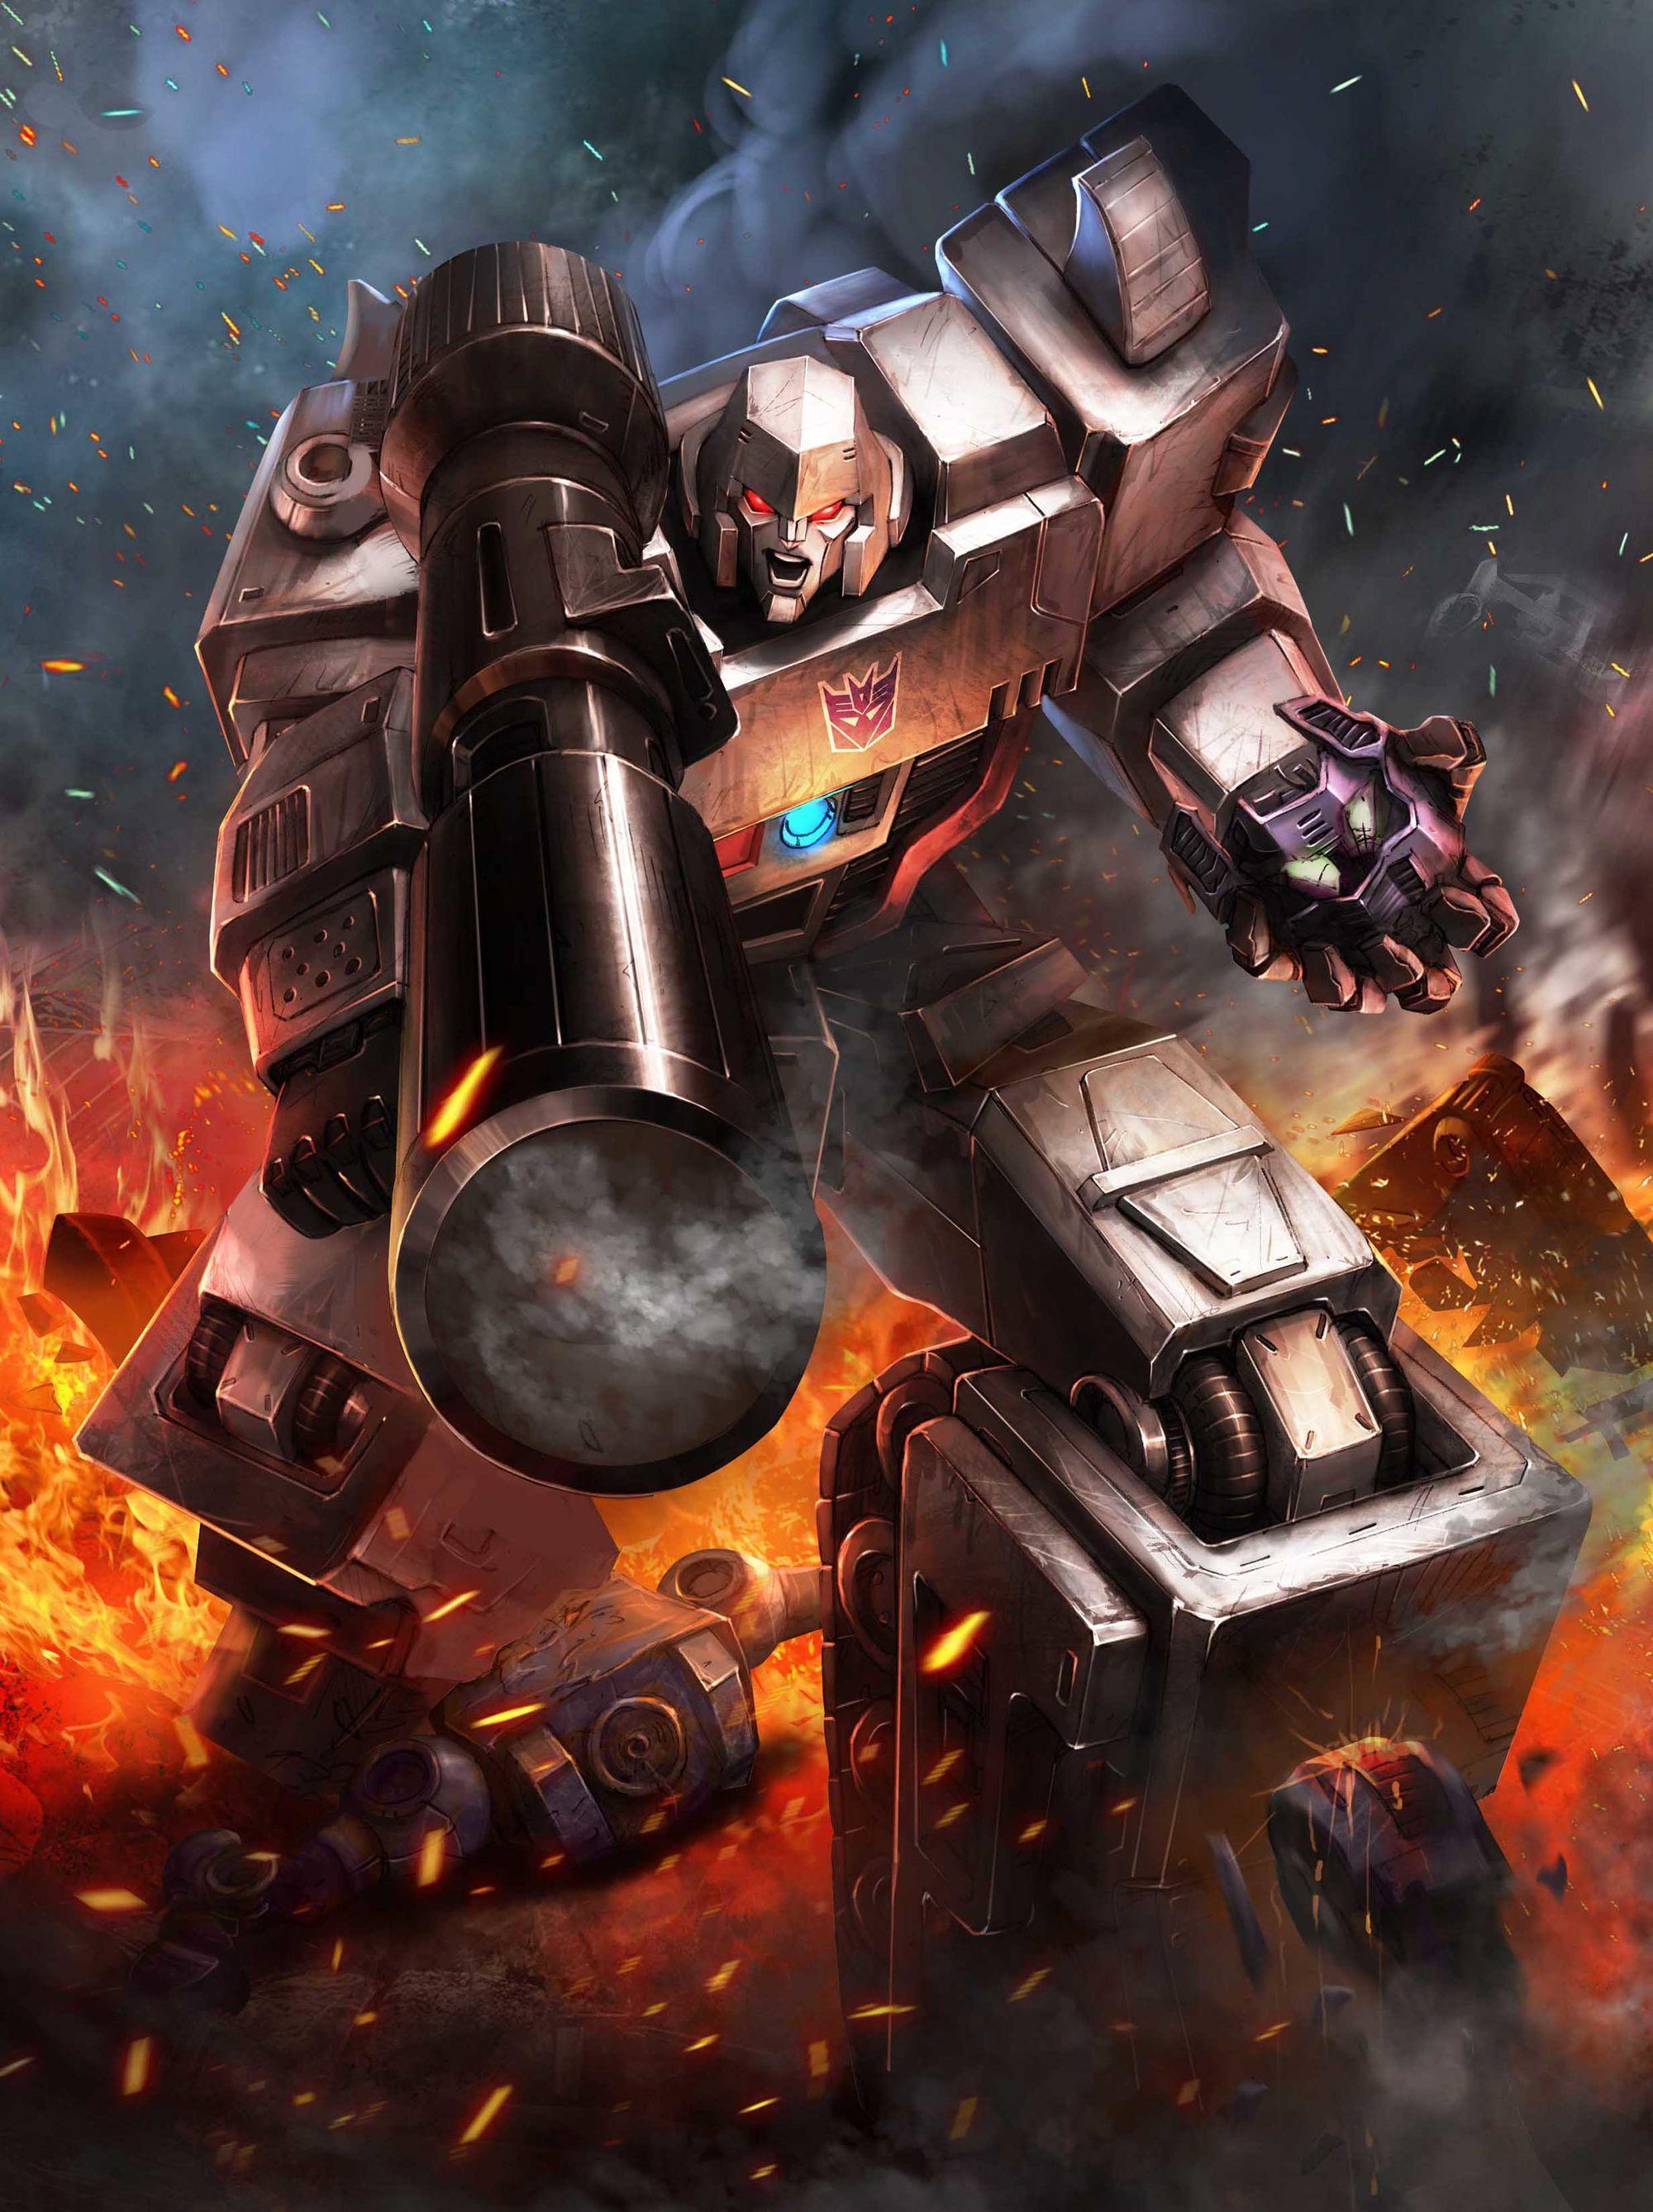 Transformers Megatron Transformers megatron